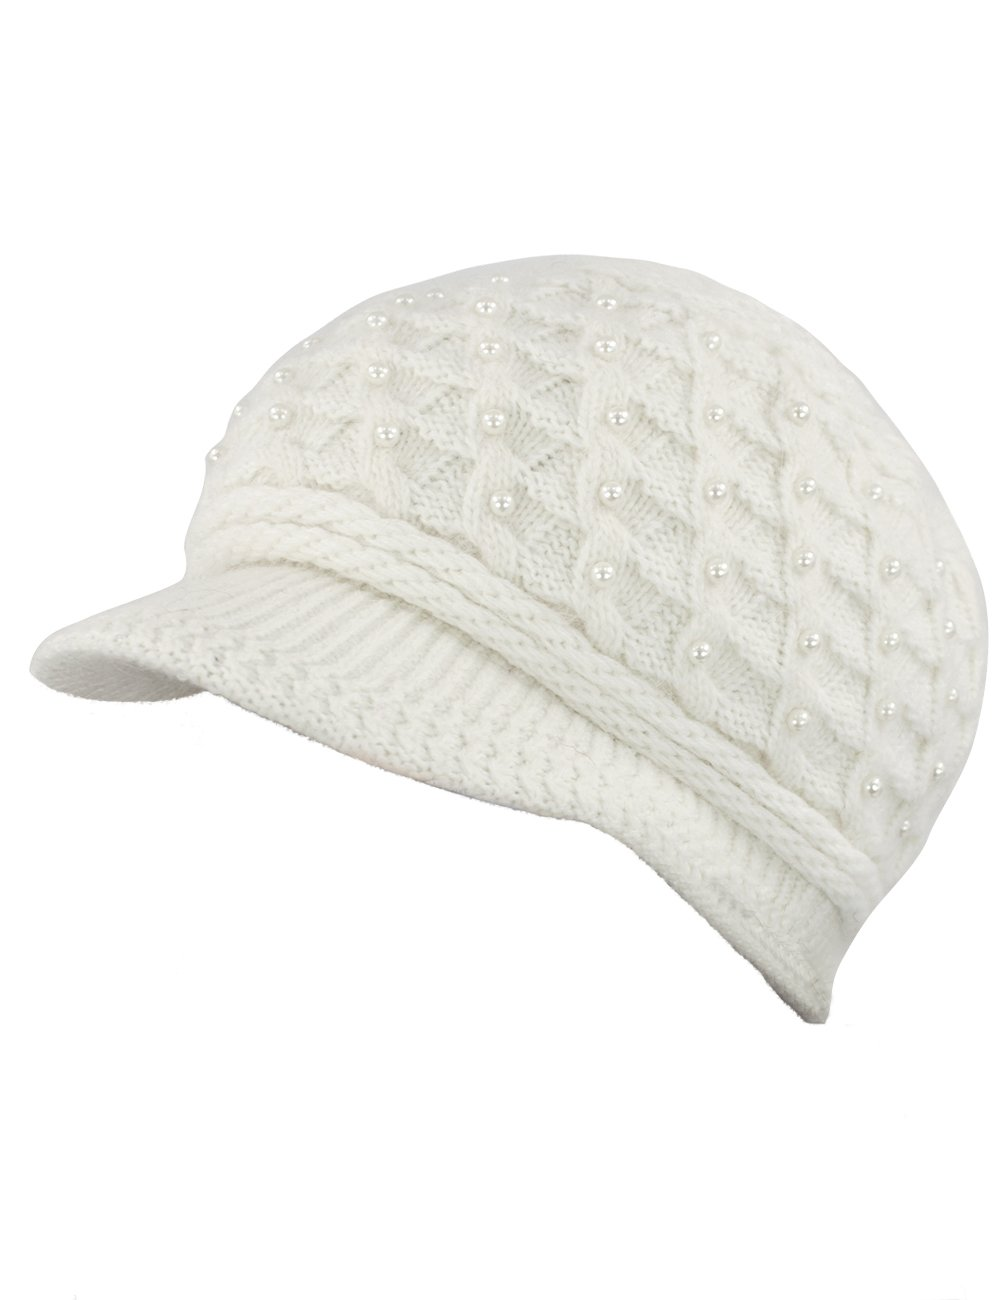 Dahlia Women's Angora Newsboy Cap Hat - Faux Pearl Accent - Dual Layer White